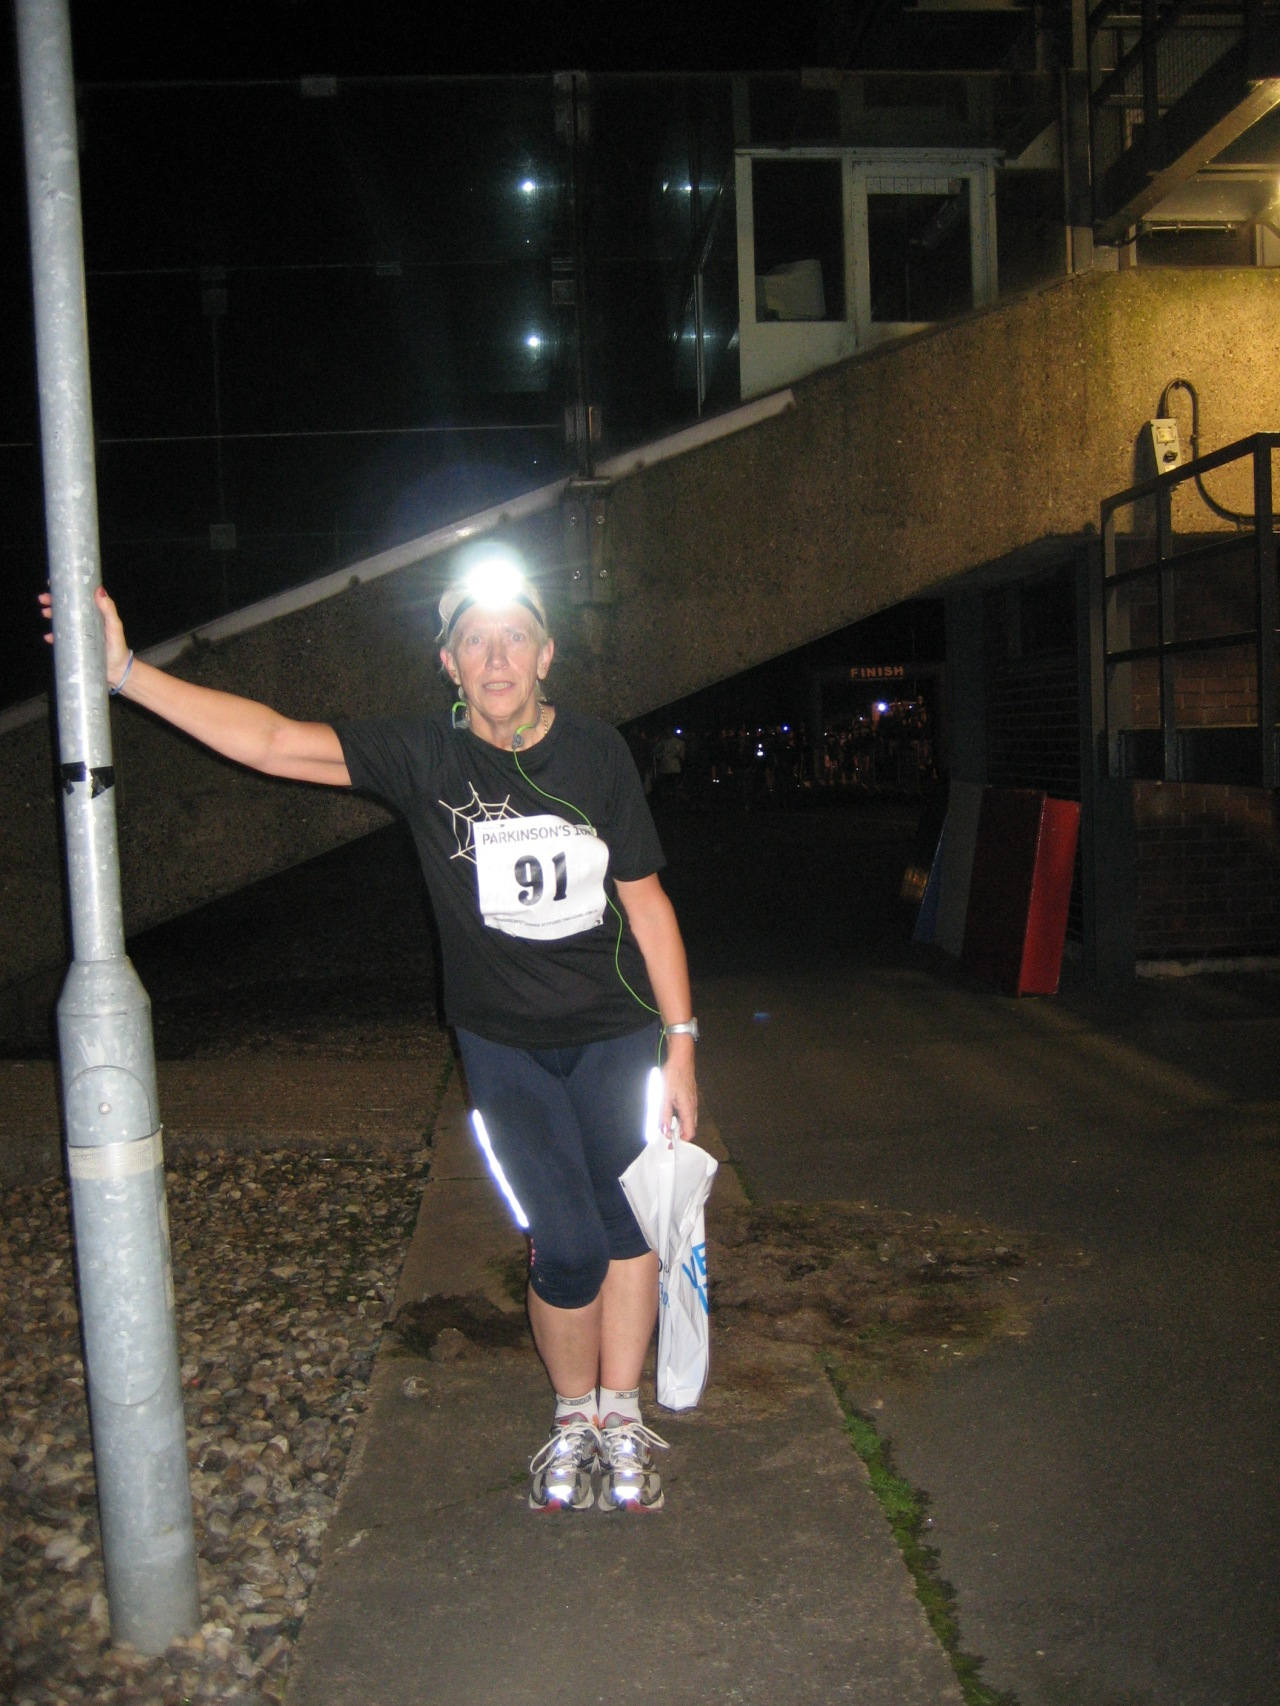 Running 2010 – Spooky Sprint 10K, HolmePierrepoint